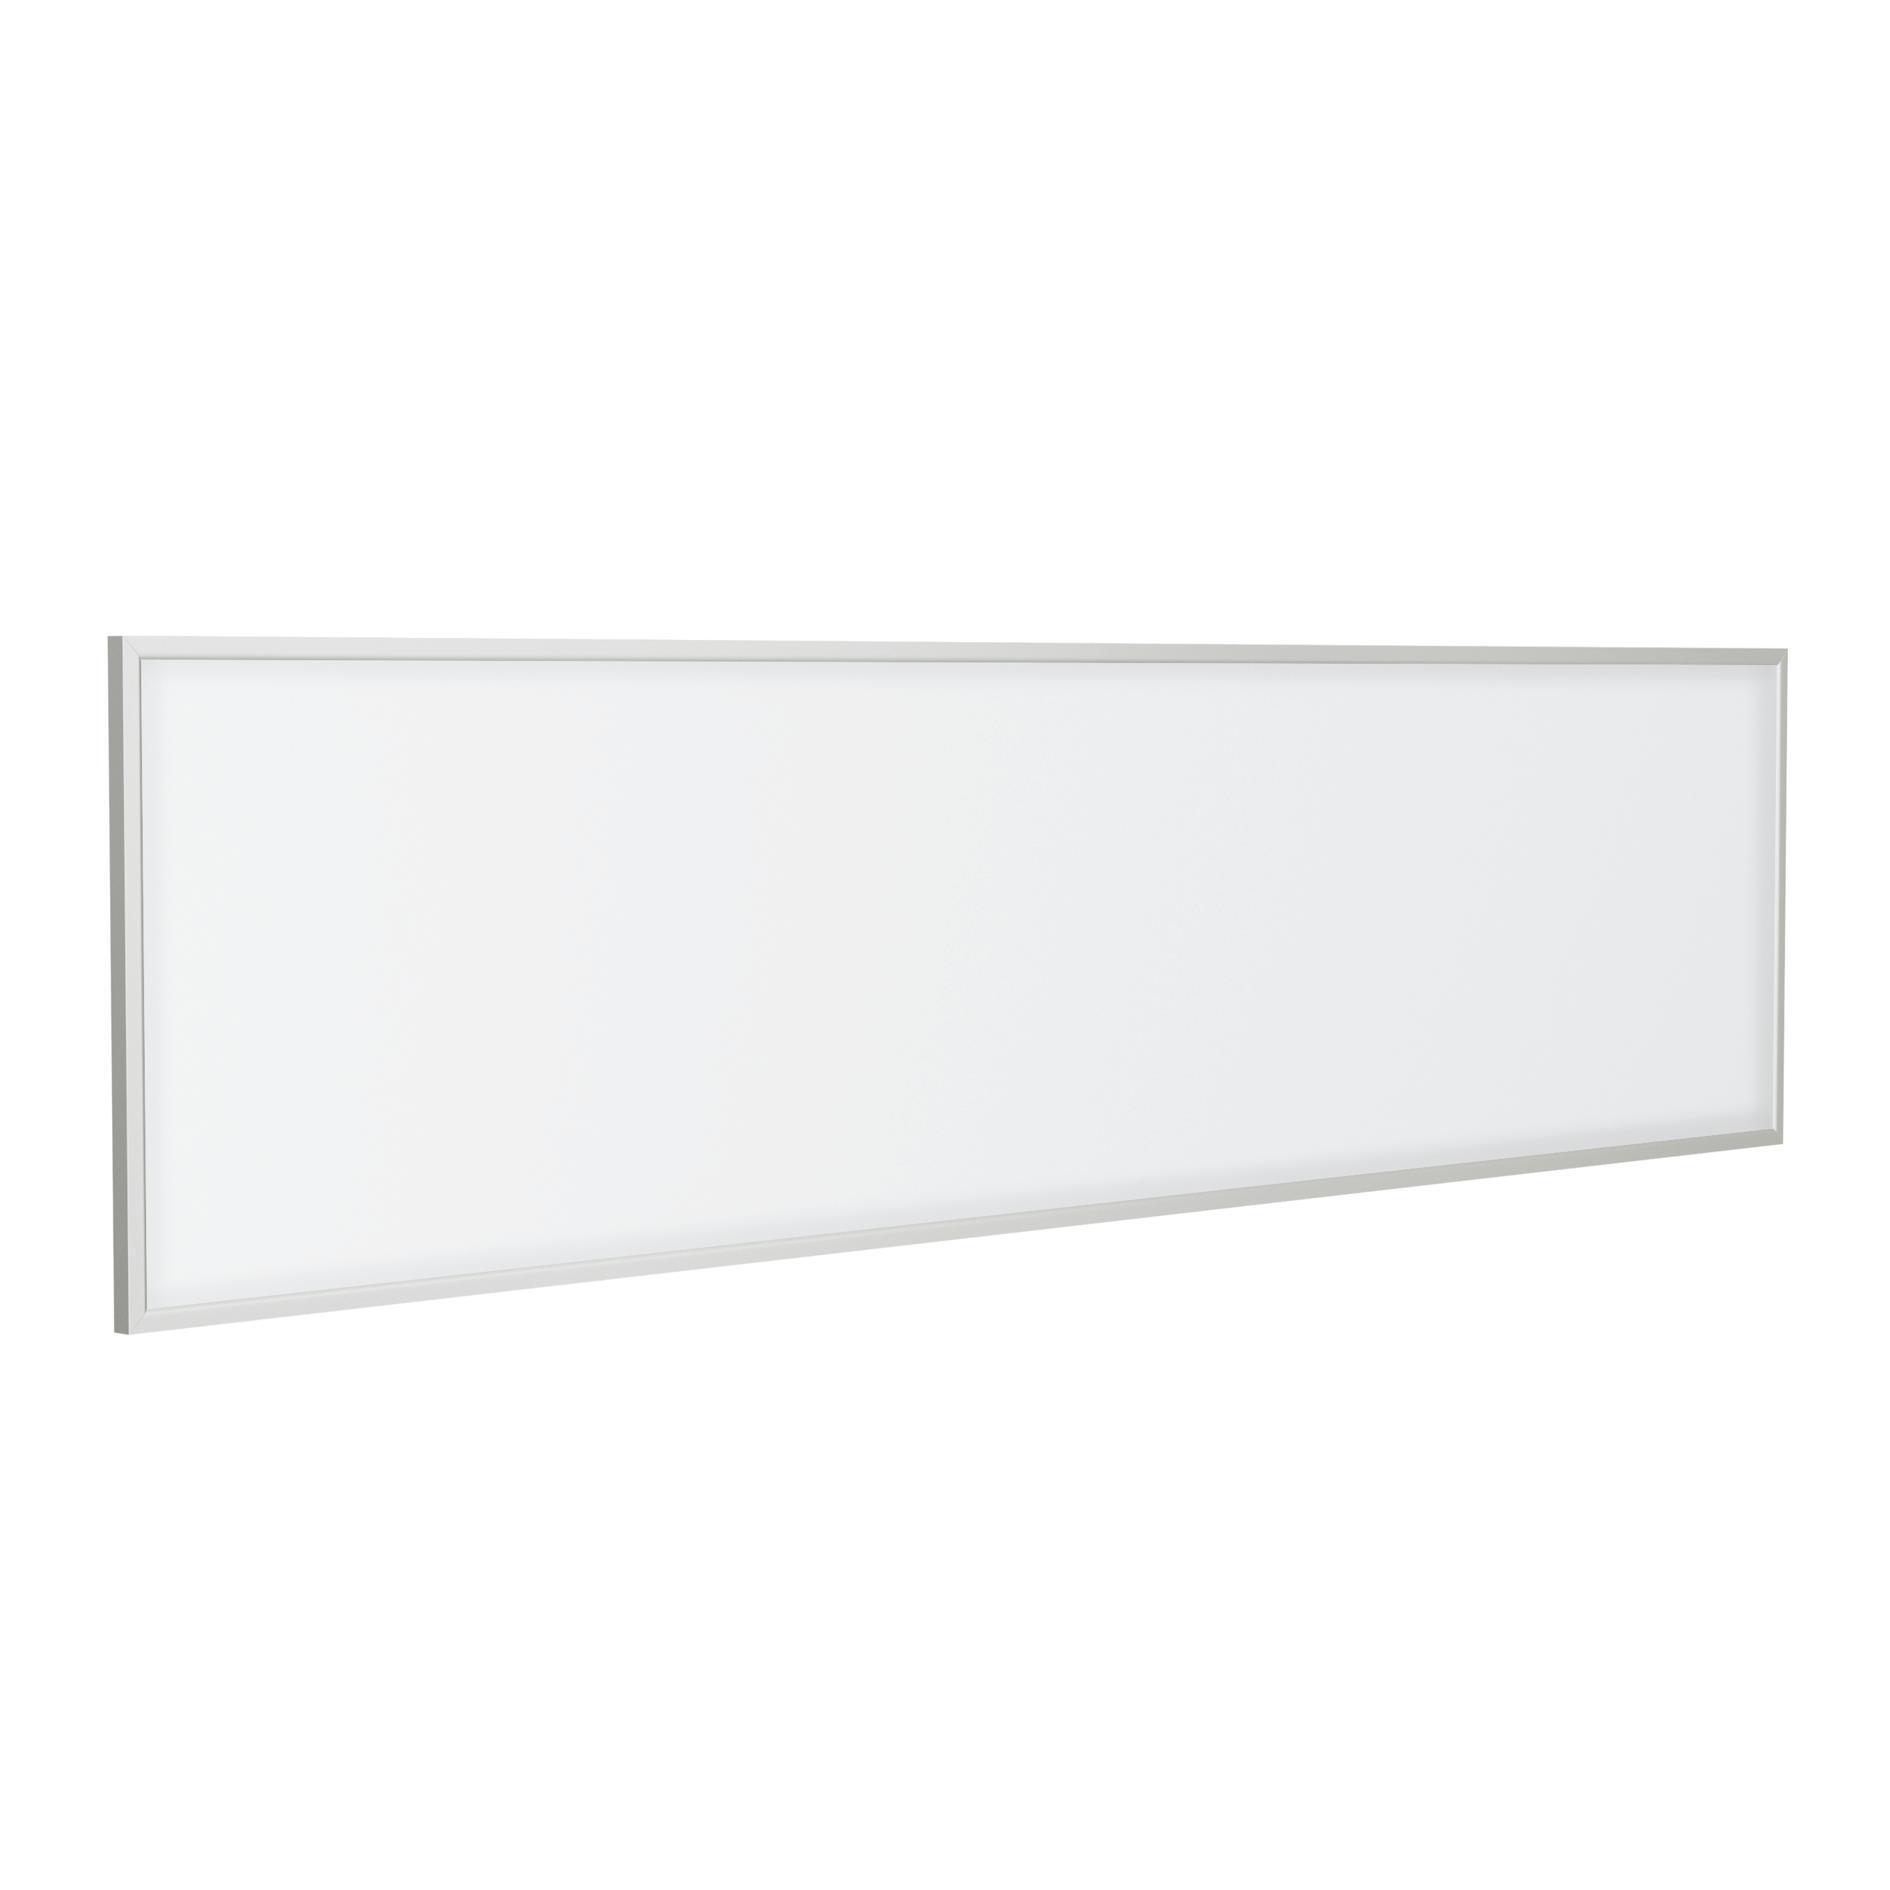 Pannello led Gdansk 30x120 cm bianco freddo, 4200LM INSPIRE - 5